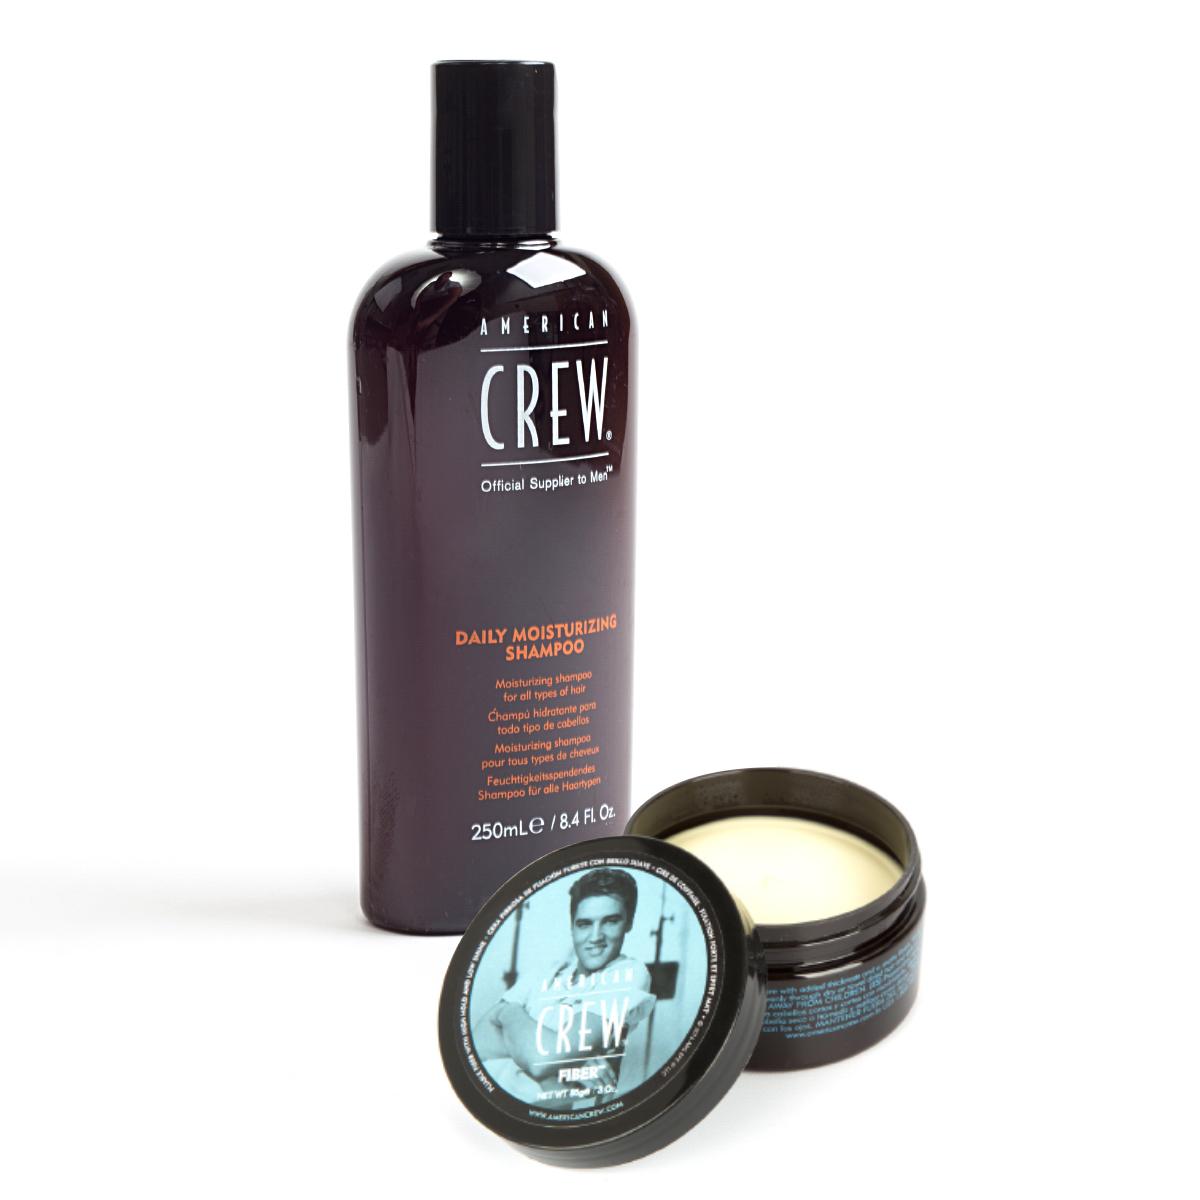 American Crew King Fiber + Daily Shampoo Bundle